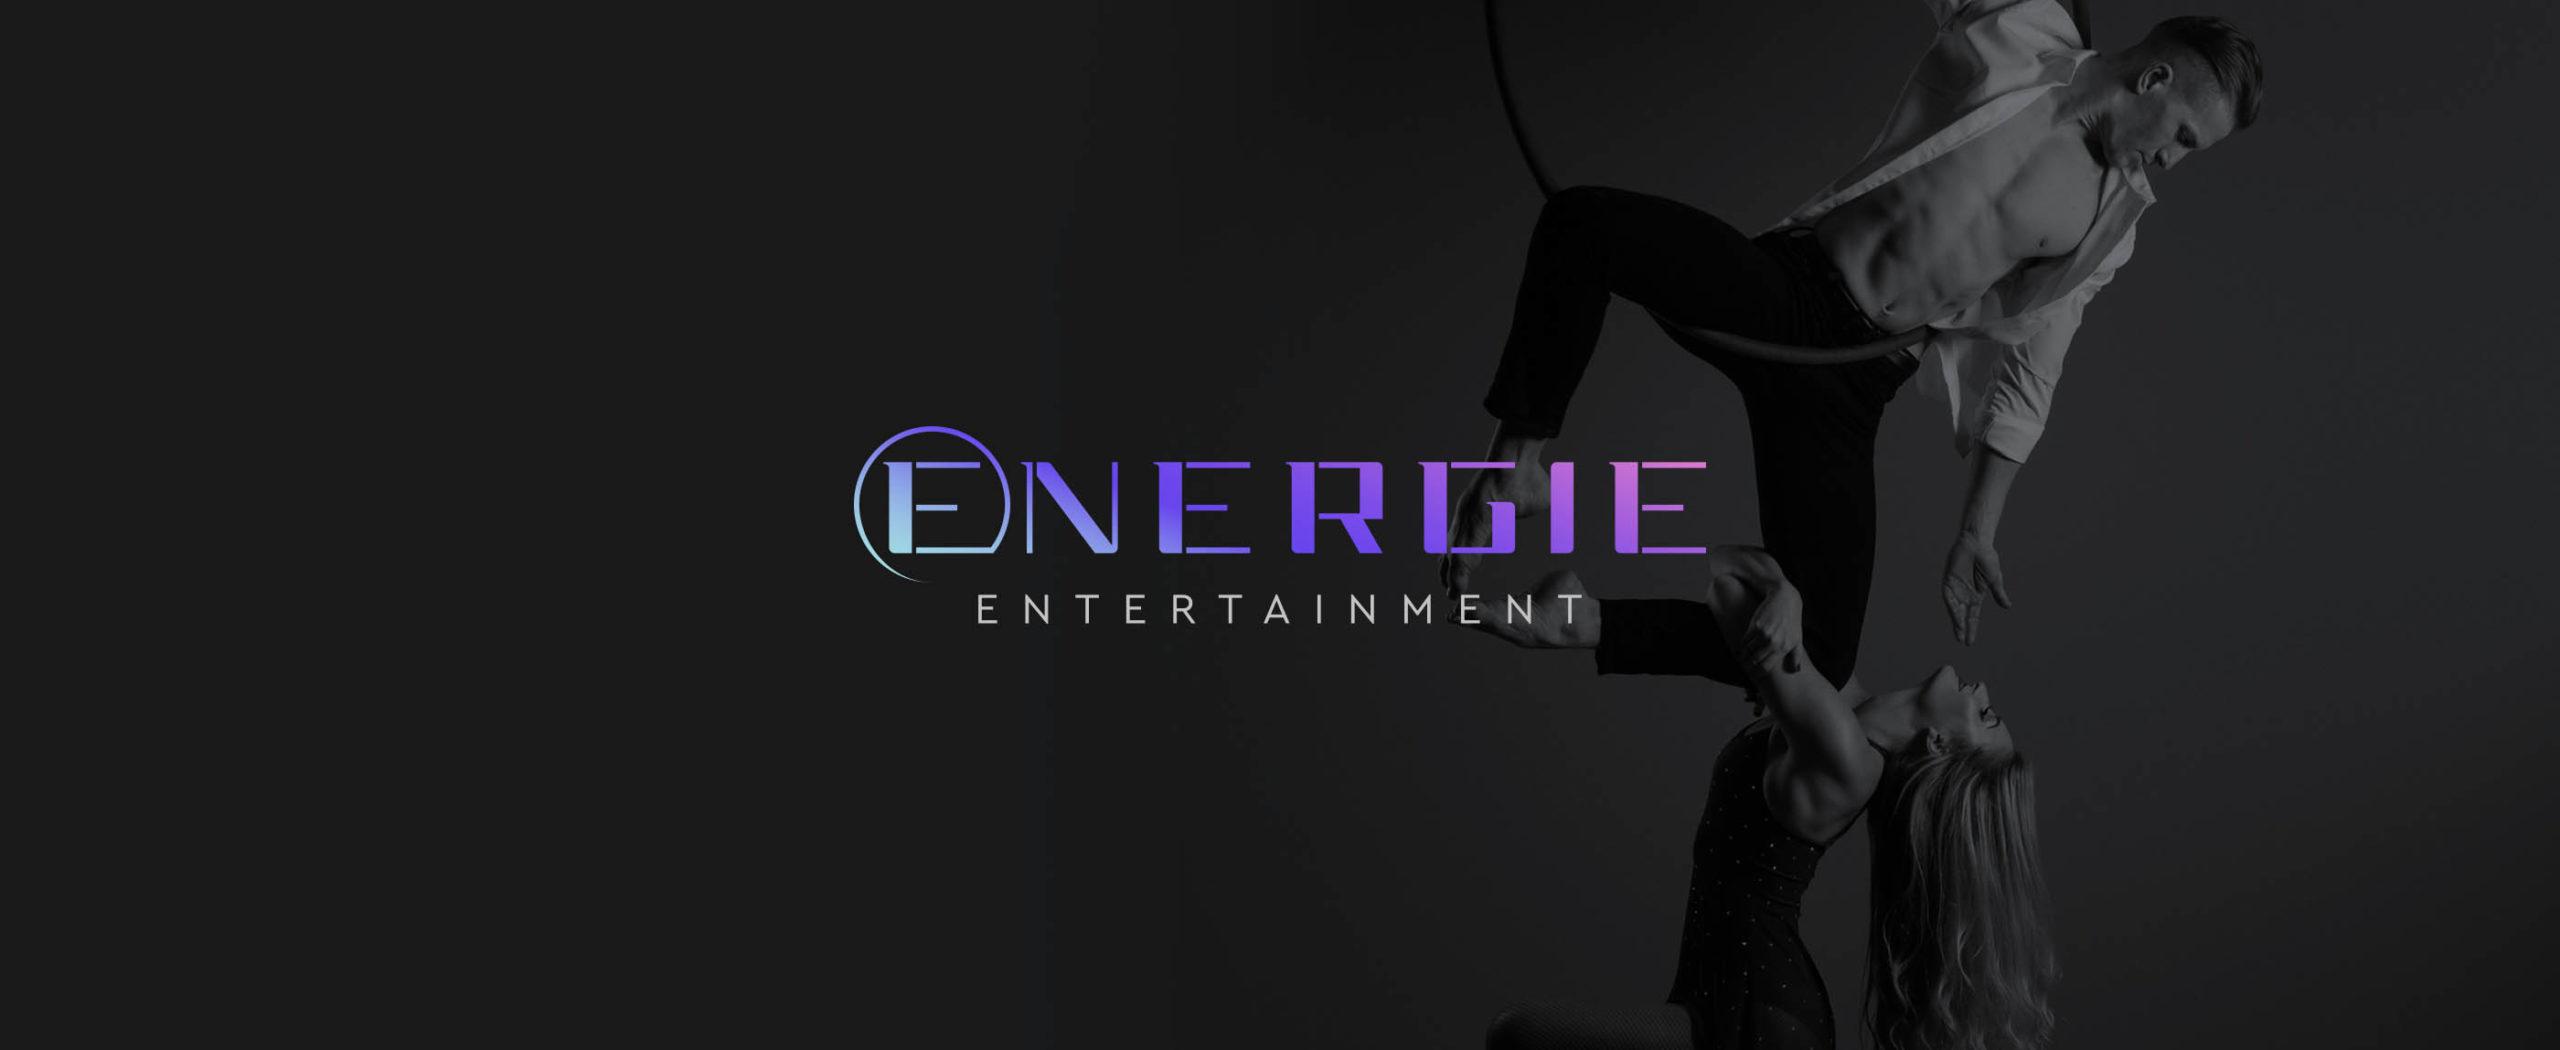 Energie-Entertainment-Brand-Identity